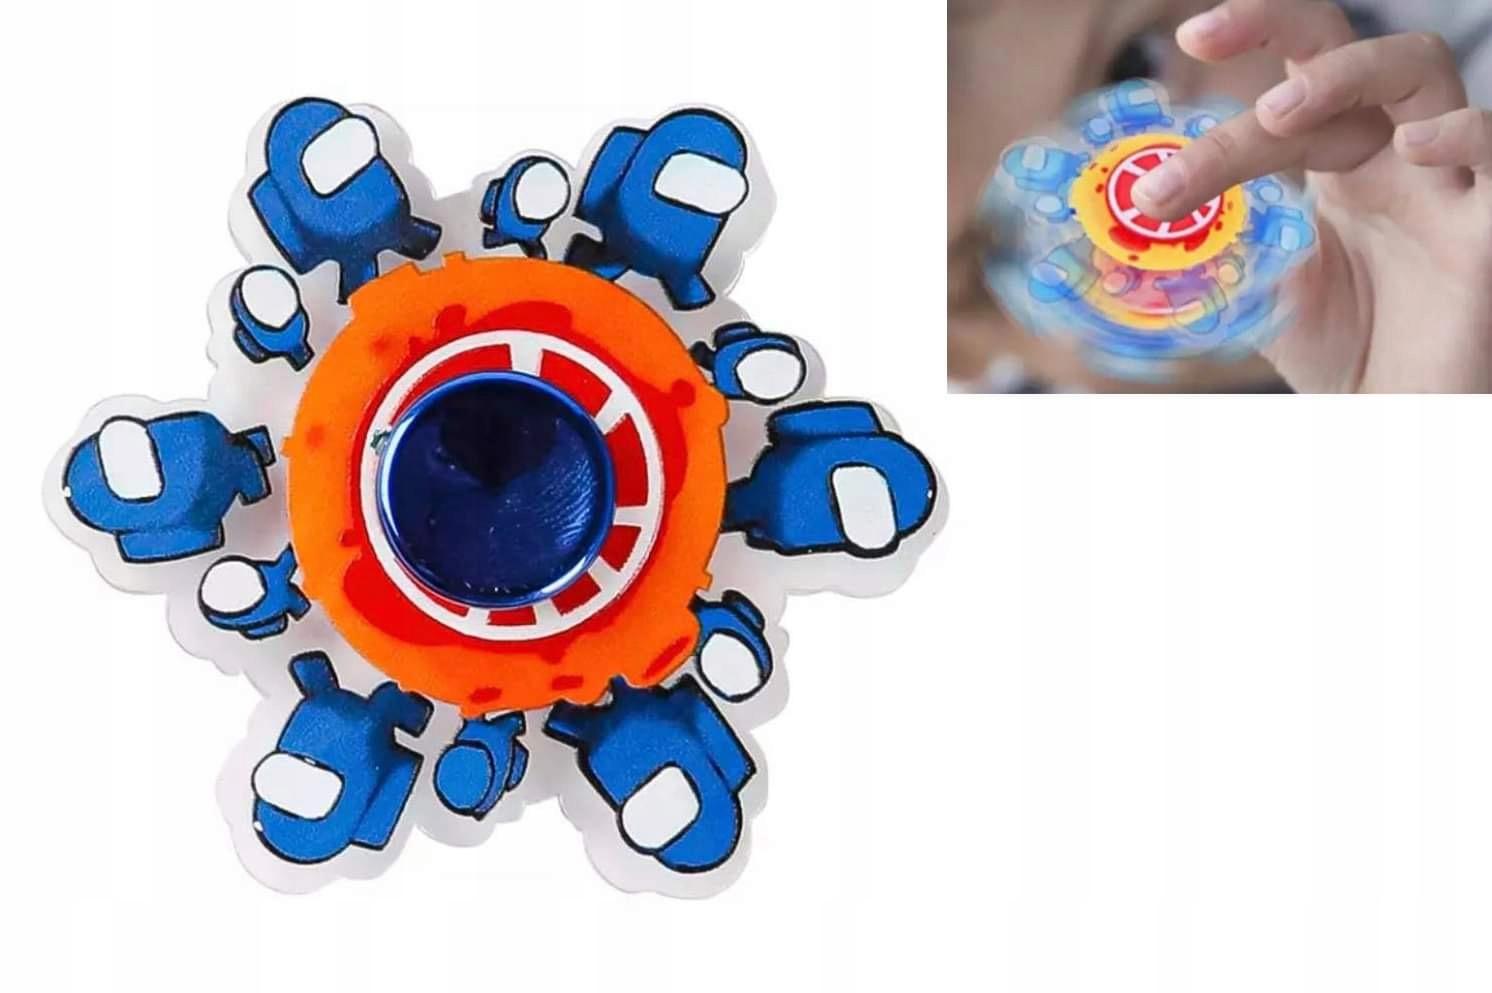 Fidget spinner esgot animacja zabawki antystresowe